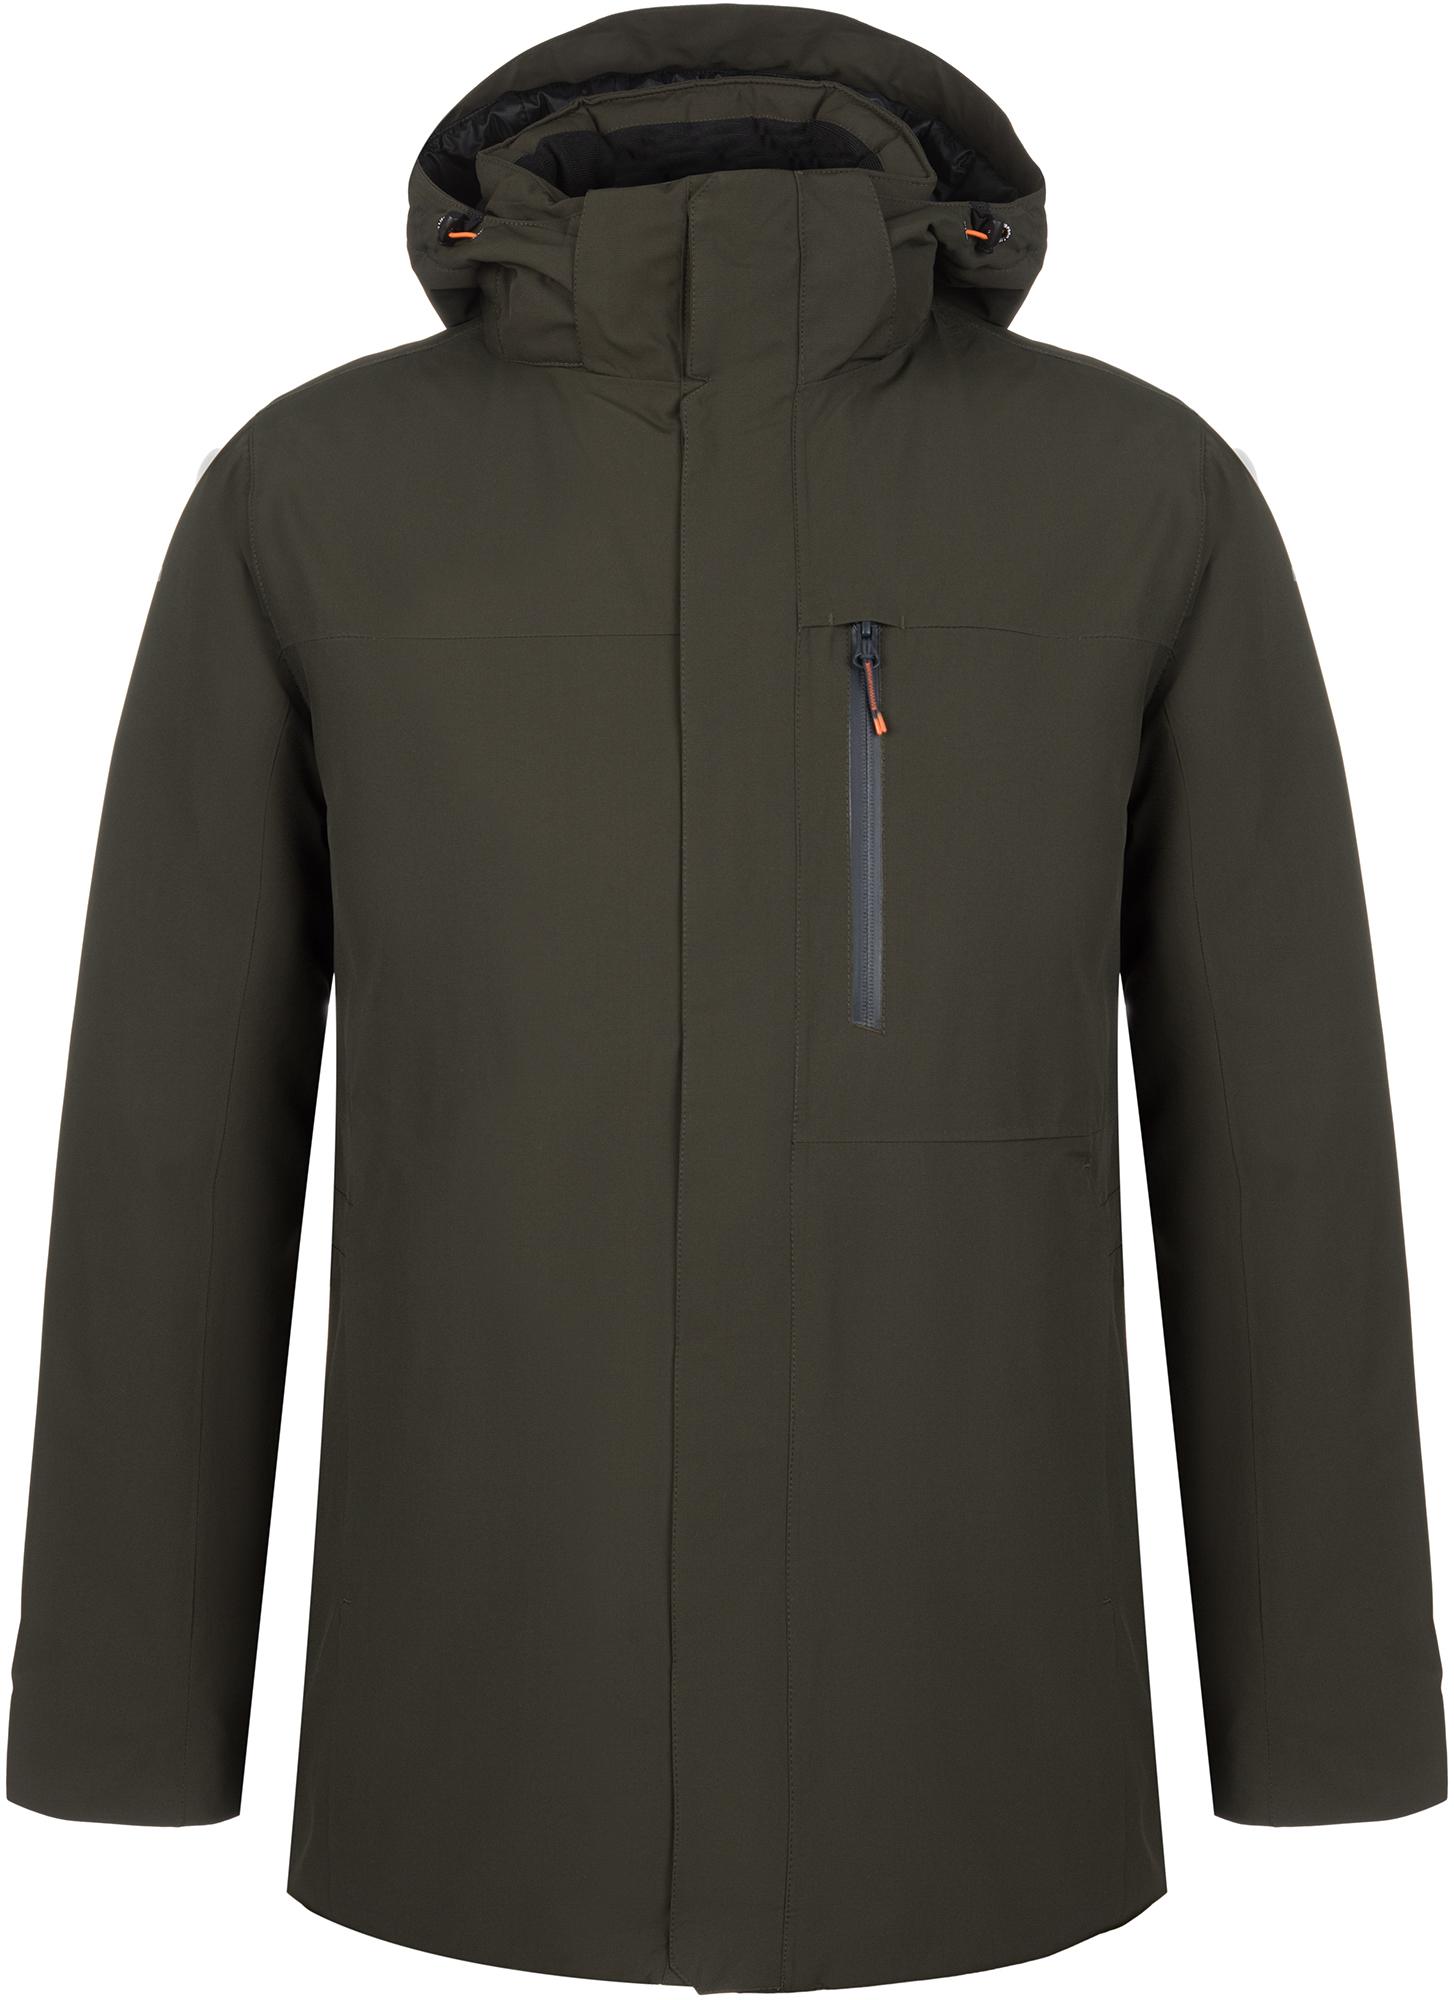 IcePeak Куртка утепленная мужская IcePeak Piedmont, размер 50